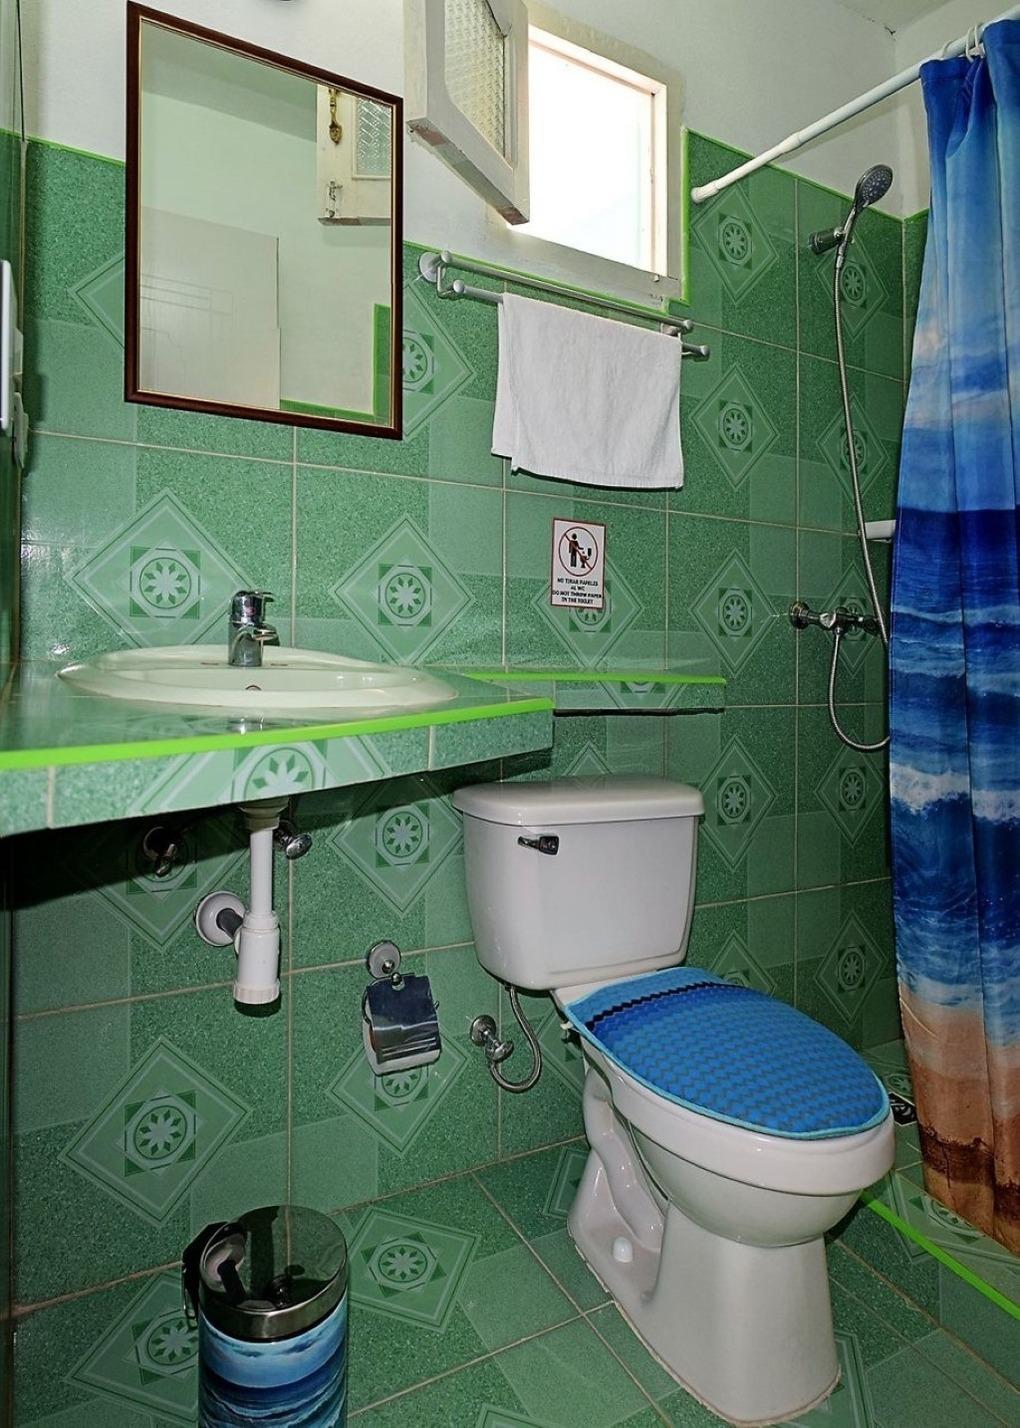 B&B Hostal Shalom Appartement 1 Ferienwohnung in Trinidad